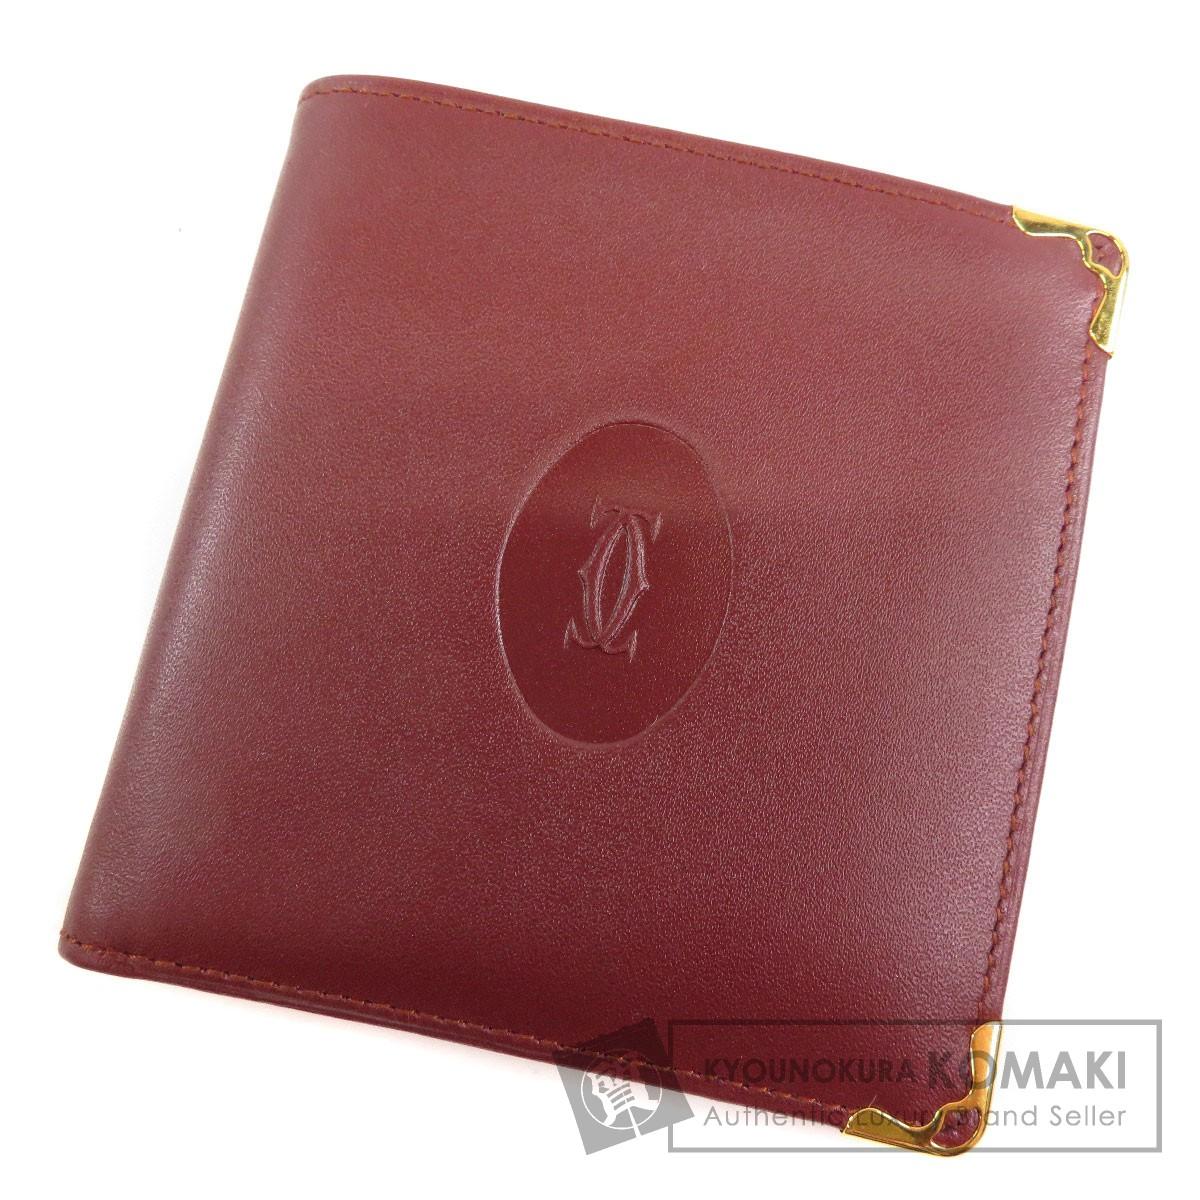 CARTIER ロゴマーク 二つ折り財布(小銭入れあり) レザー レディース 【中古】【カルティエ】